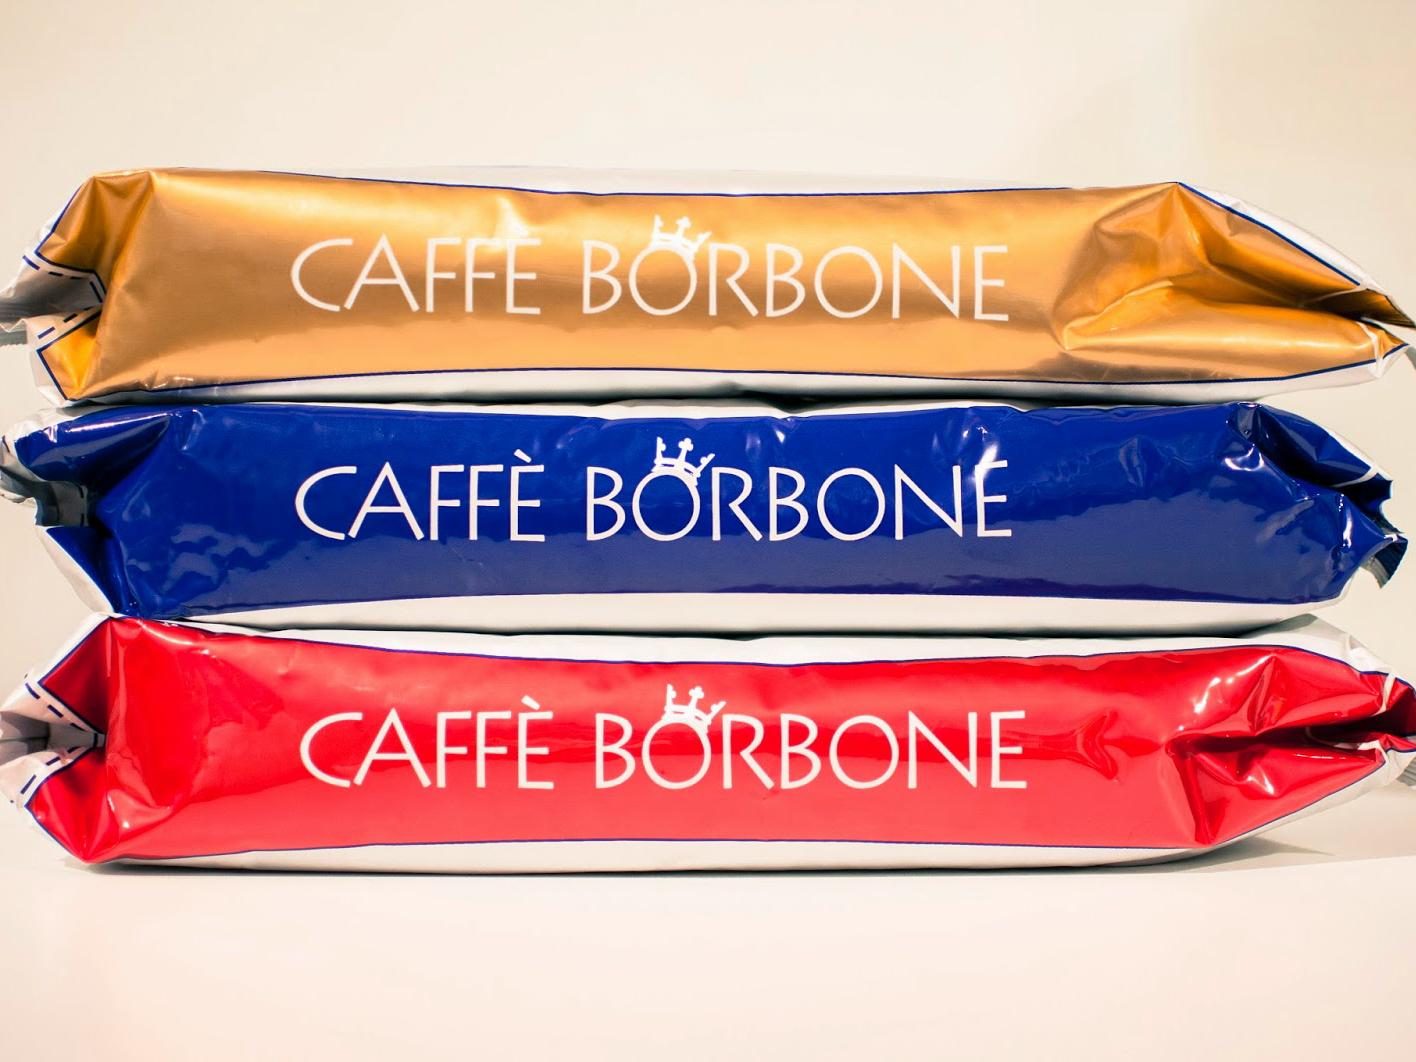 Caffè Borbone Verkostung